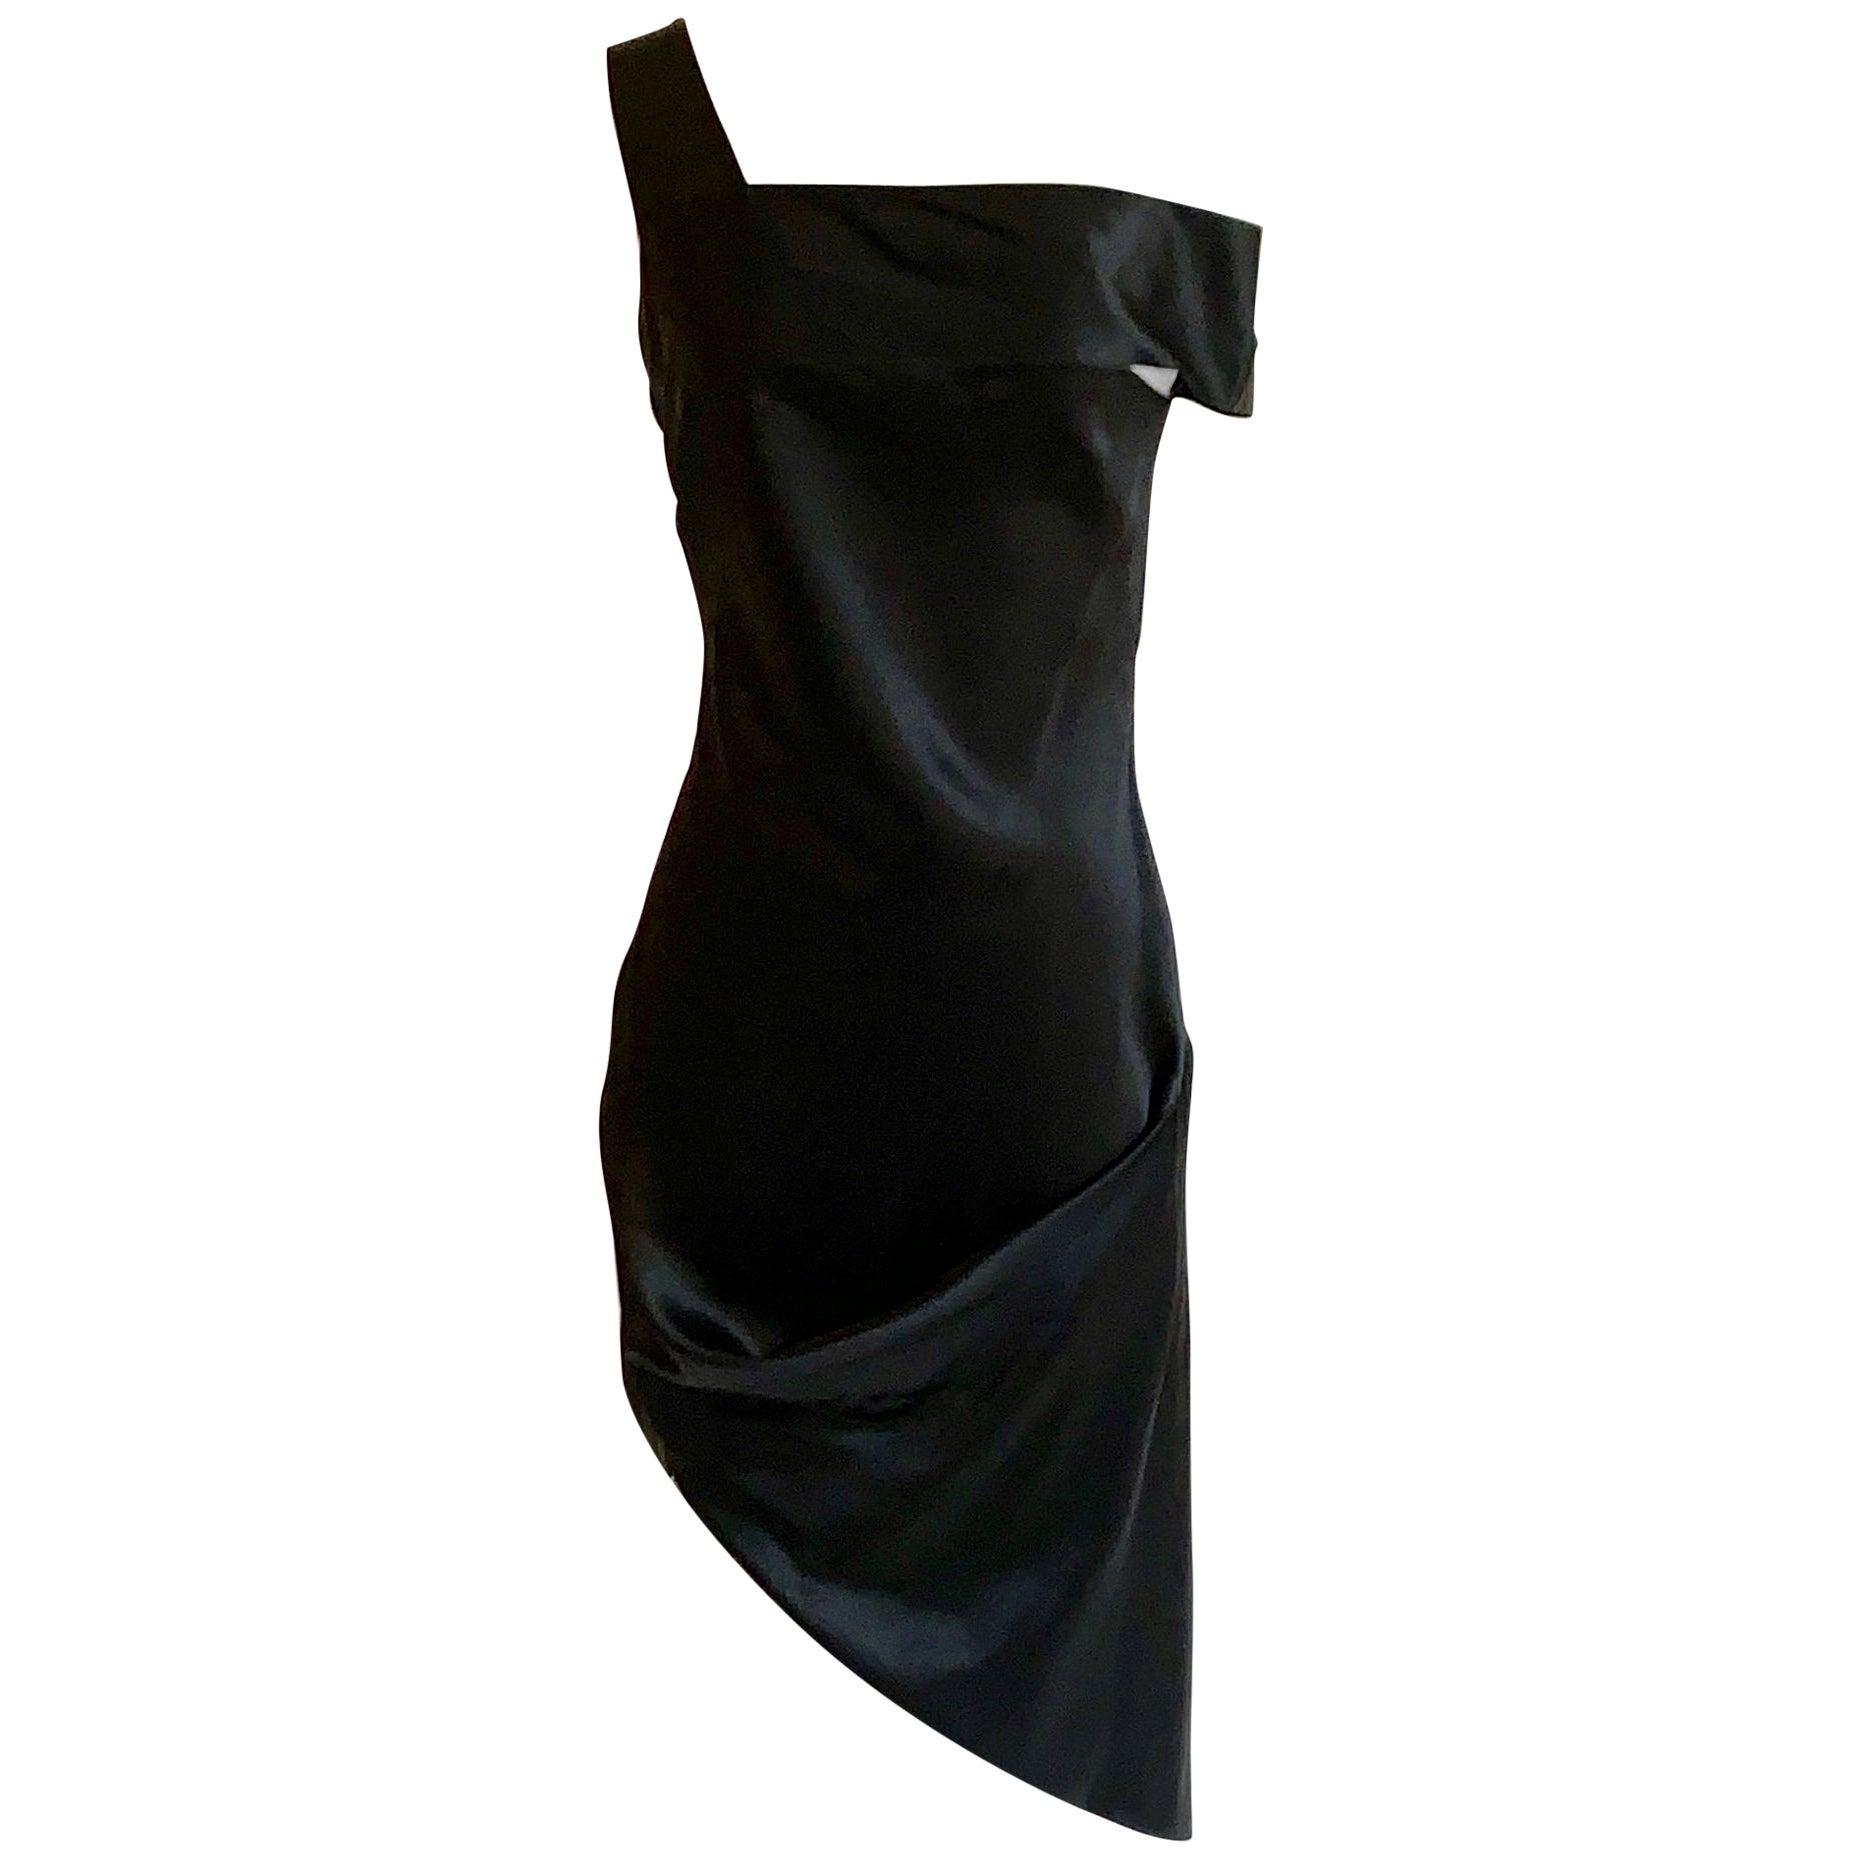 Alexander McQueen 2008 Black and Nude Silk Asymmetrical Drape Dress